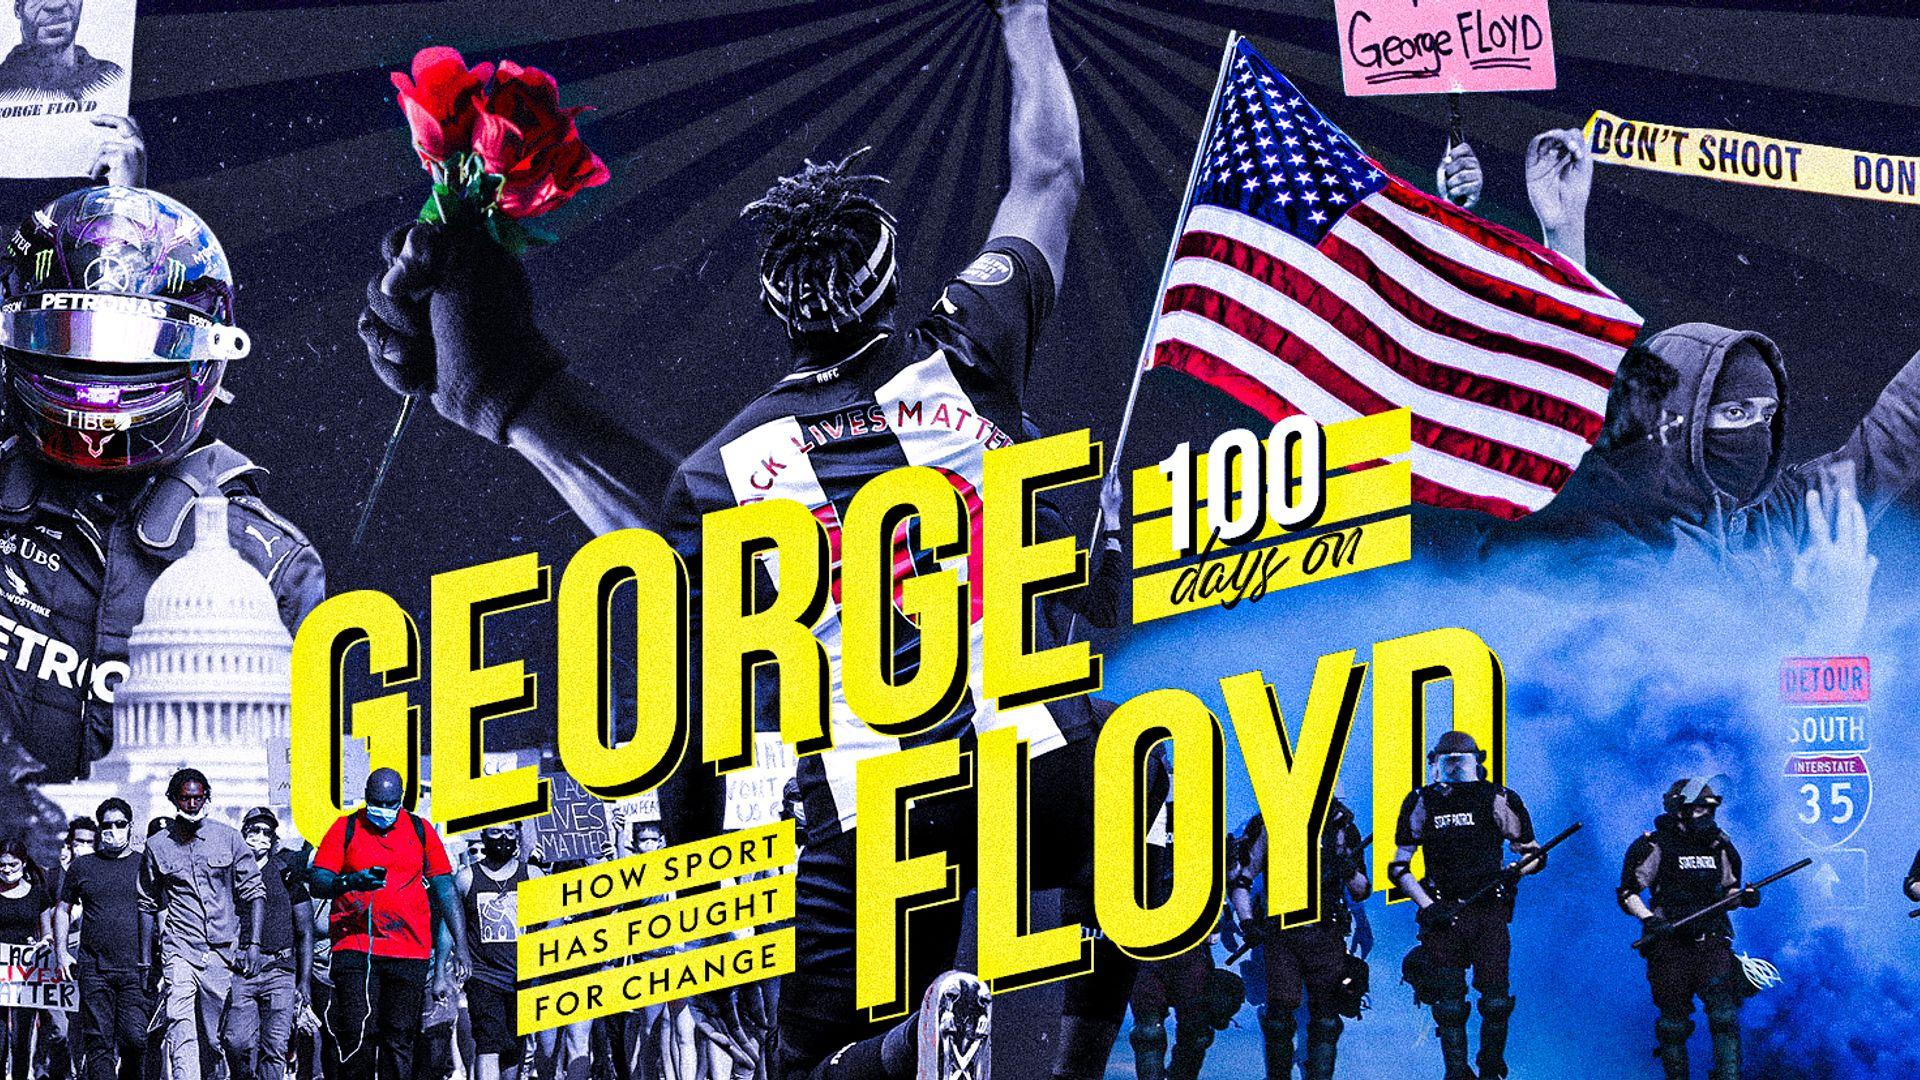 George Floyd's death: 100 days on